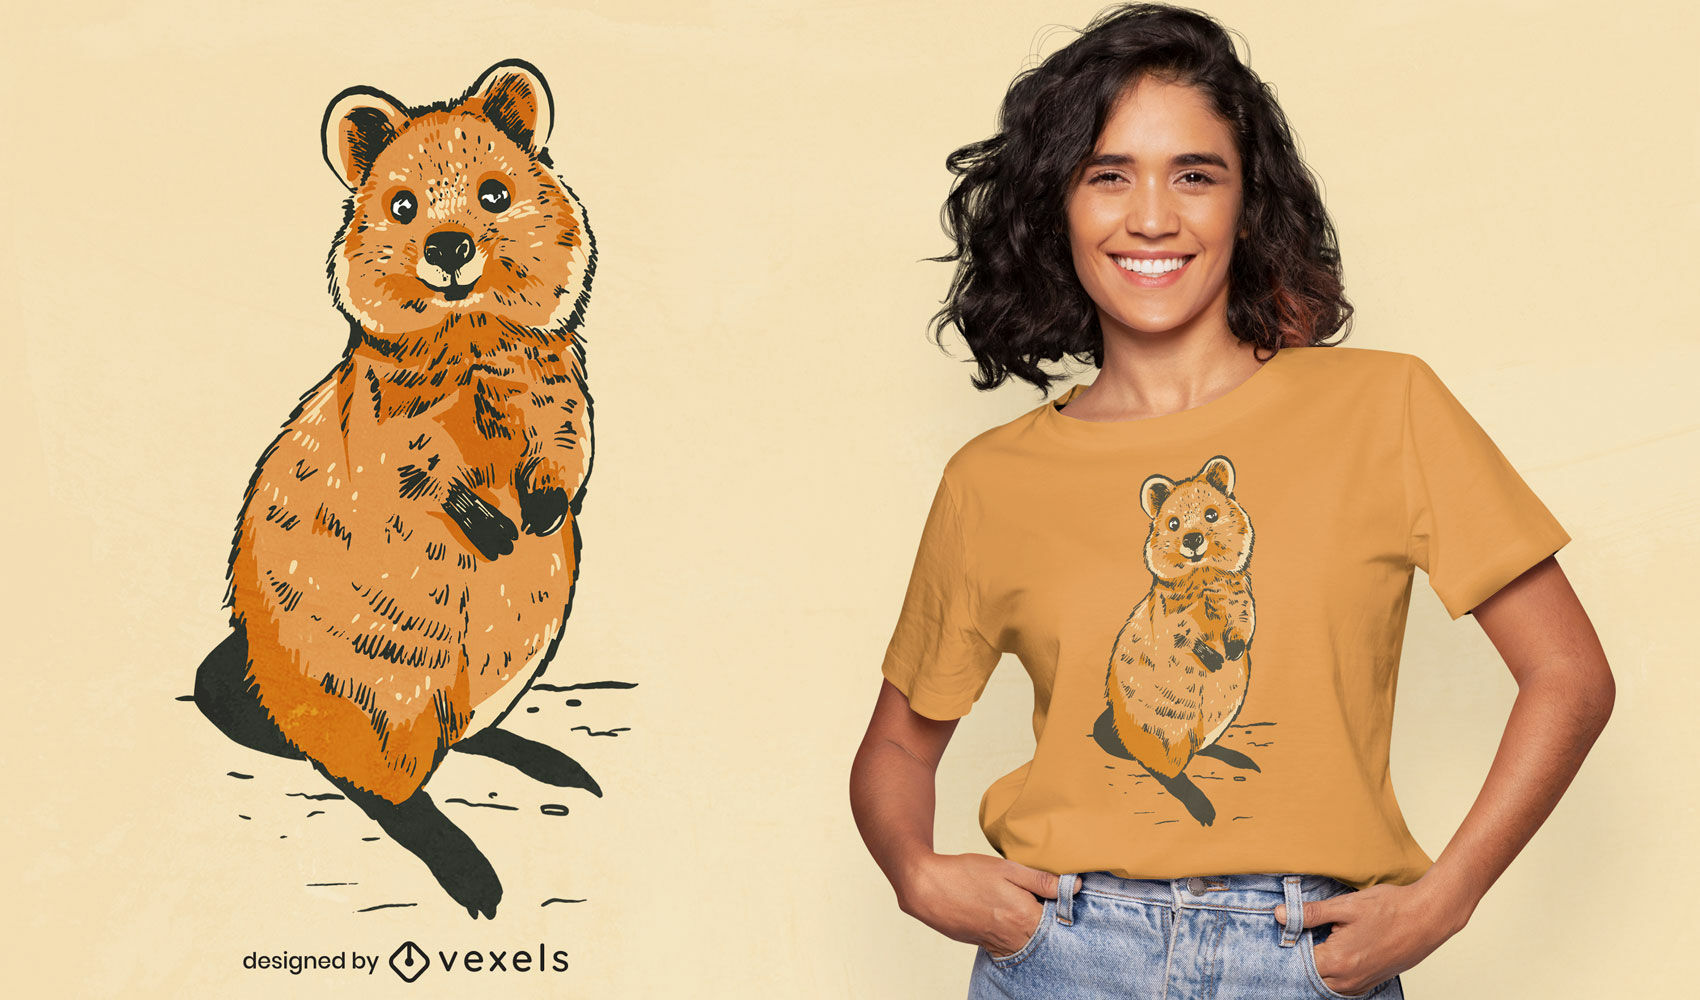 Dise?o de camiseta de animal realista Quokka.